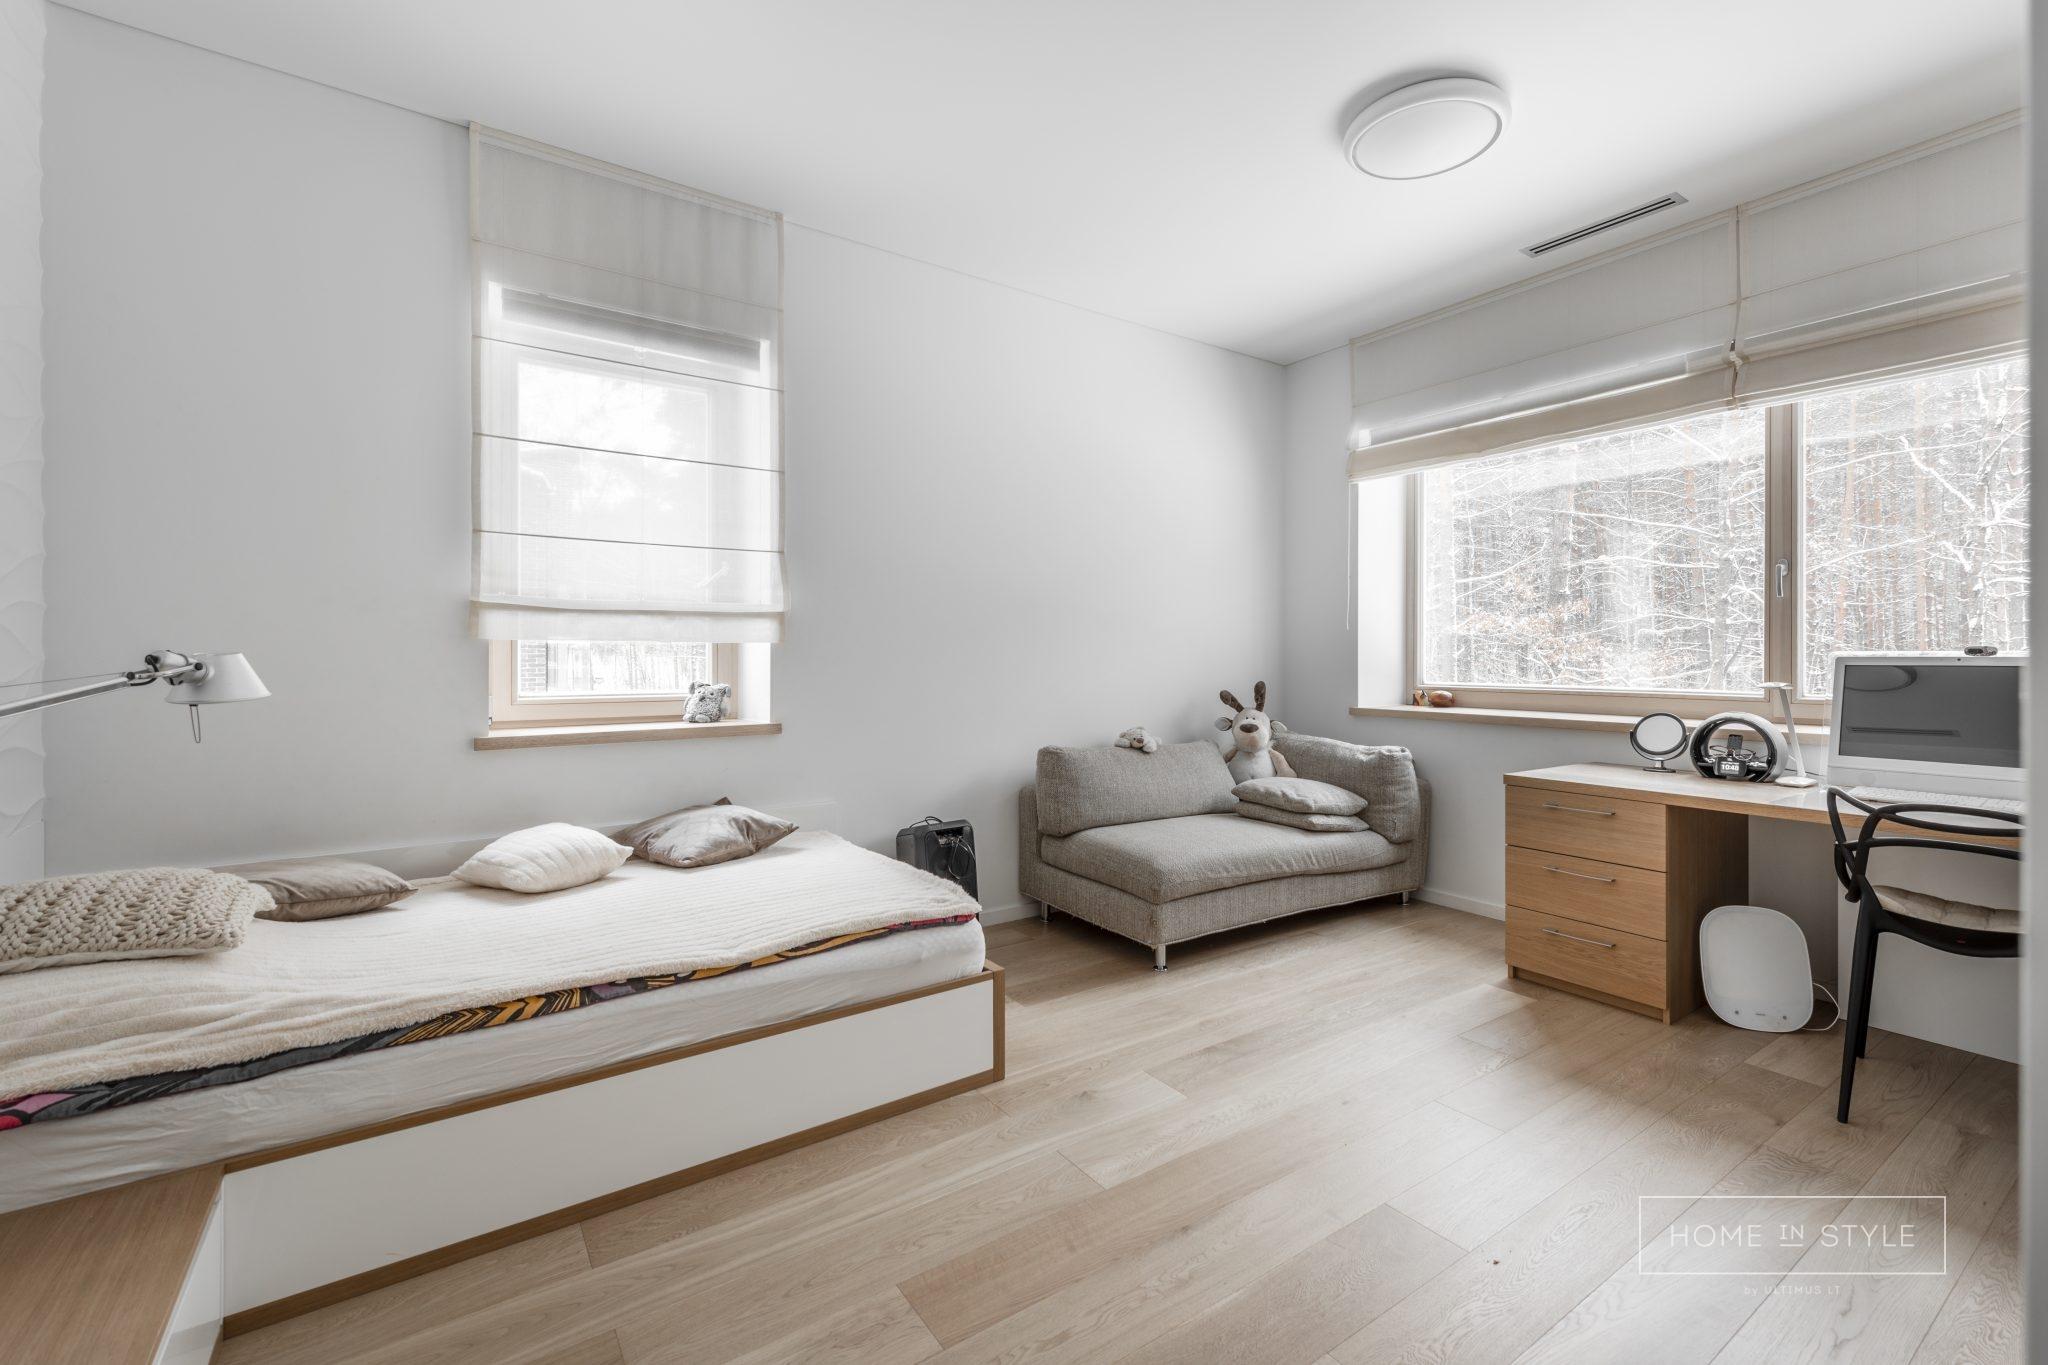 Stilingi baldai jaunuolio ir vaiku kambariui